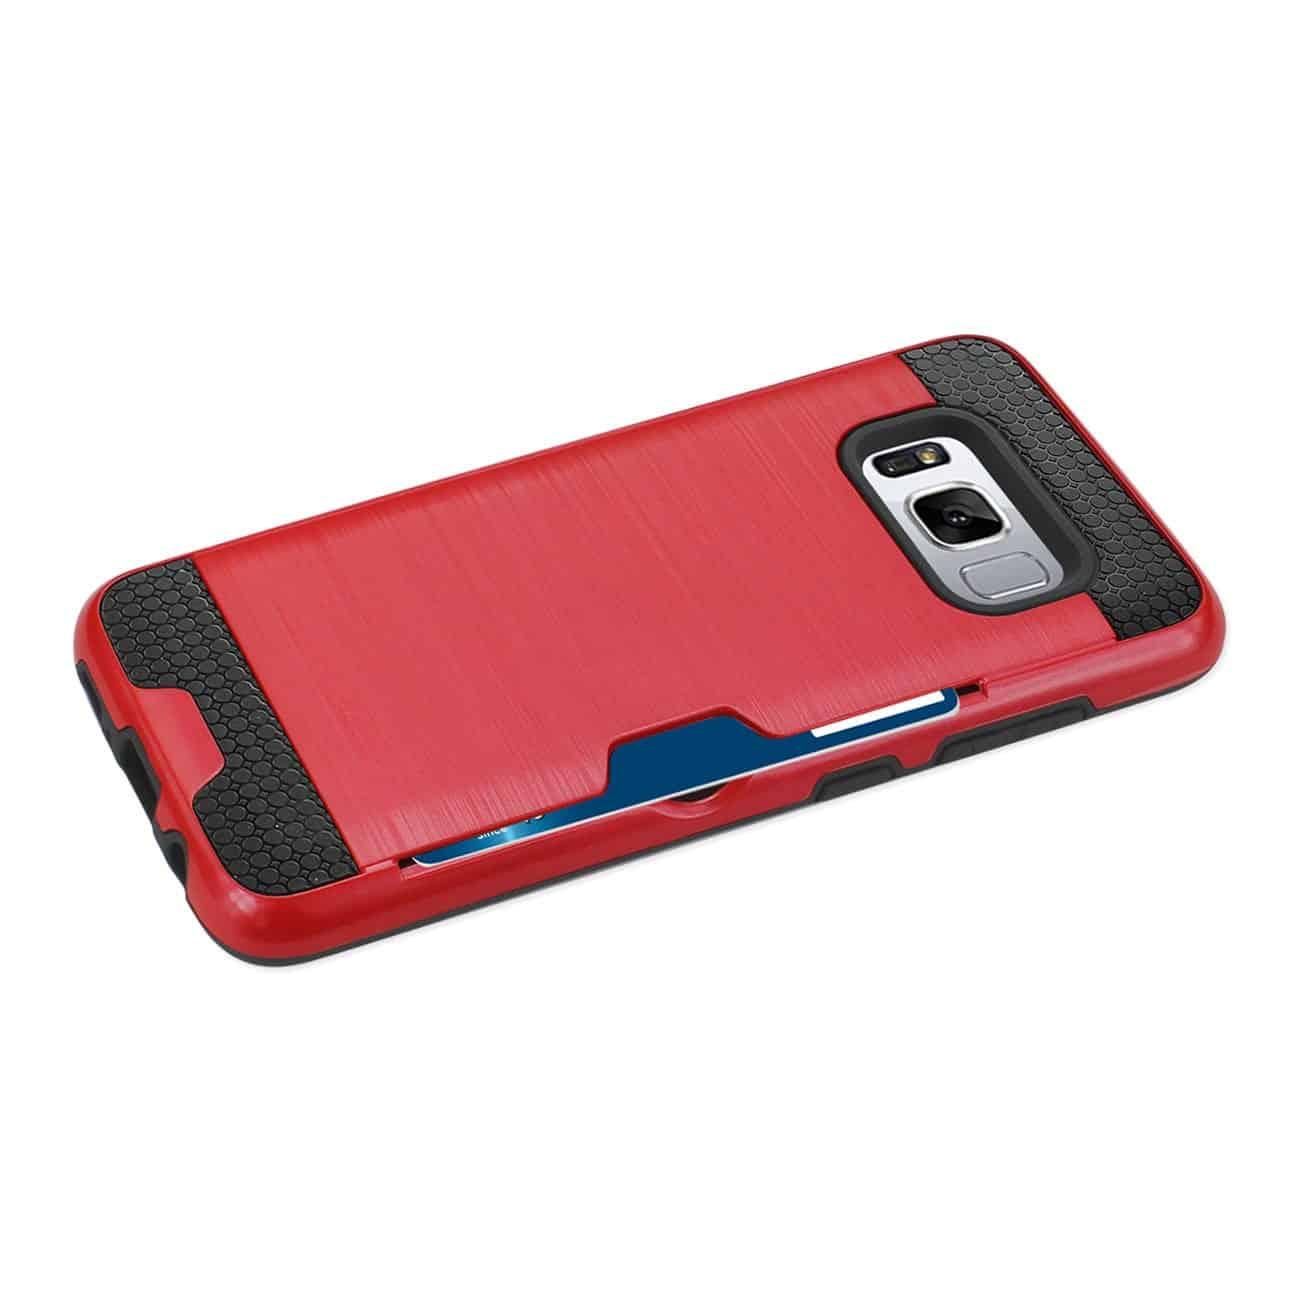 SAMSUNG GALAXY S8/ SM SLIM ARMOR HYBRID CASE WITH CARD HOLDER IN RED